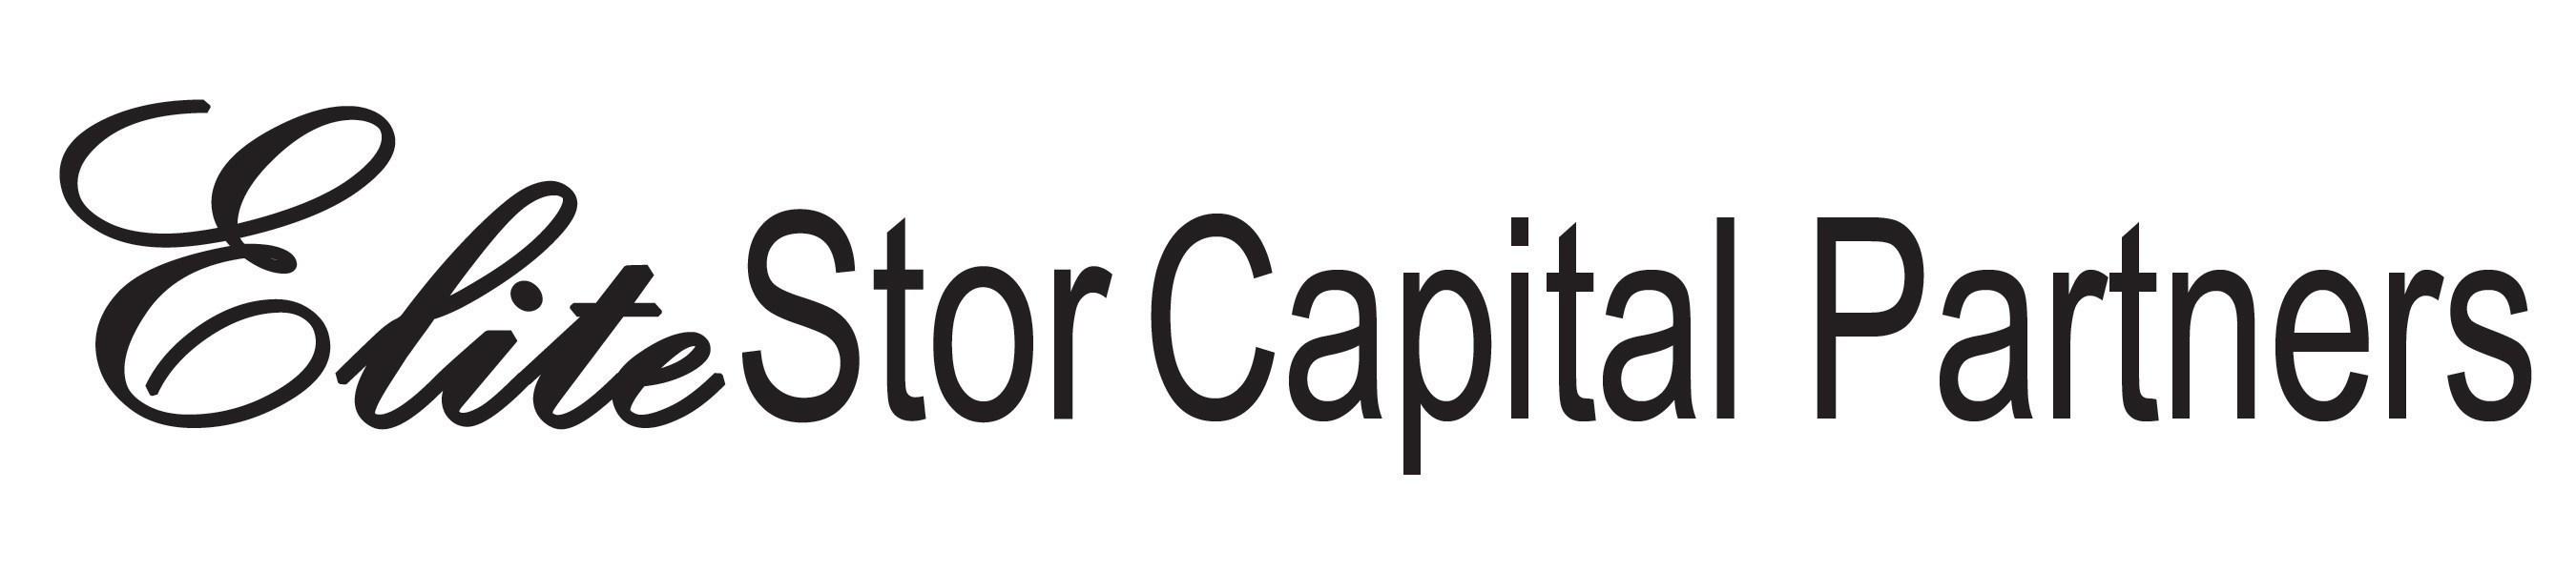 Elite Stor Capital Partners logo